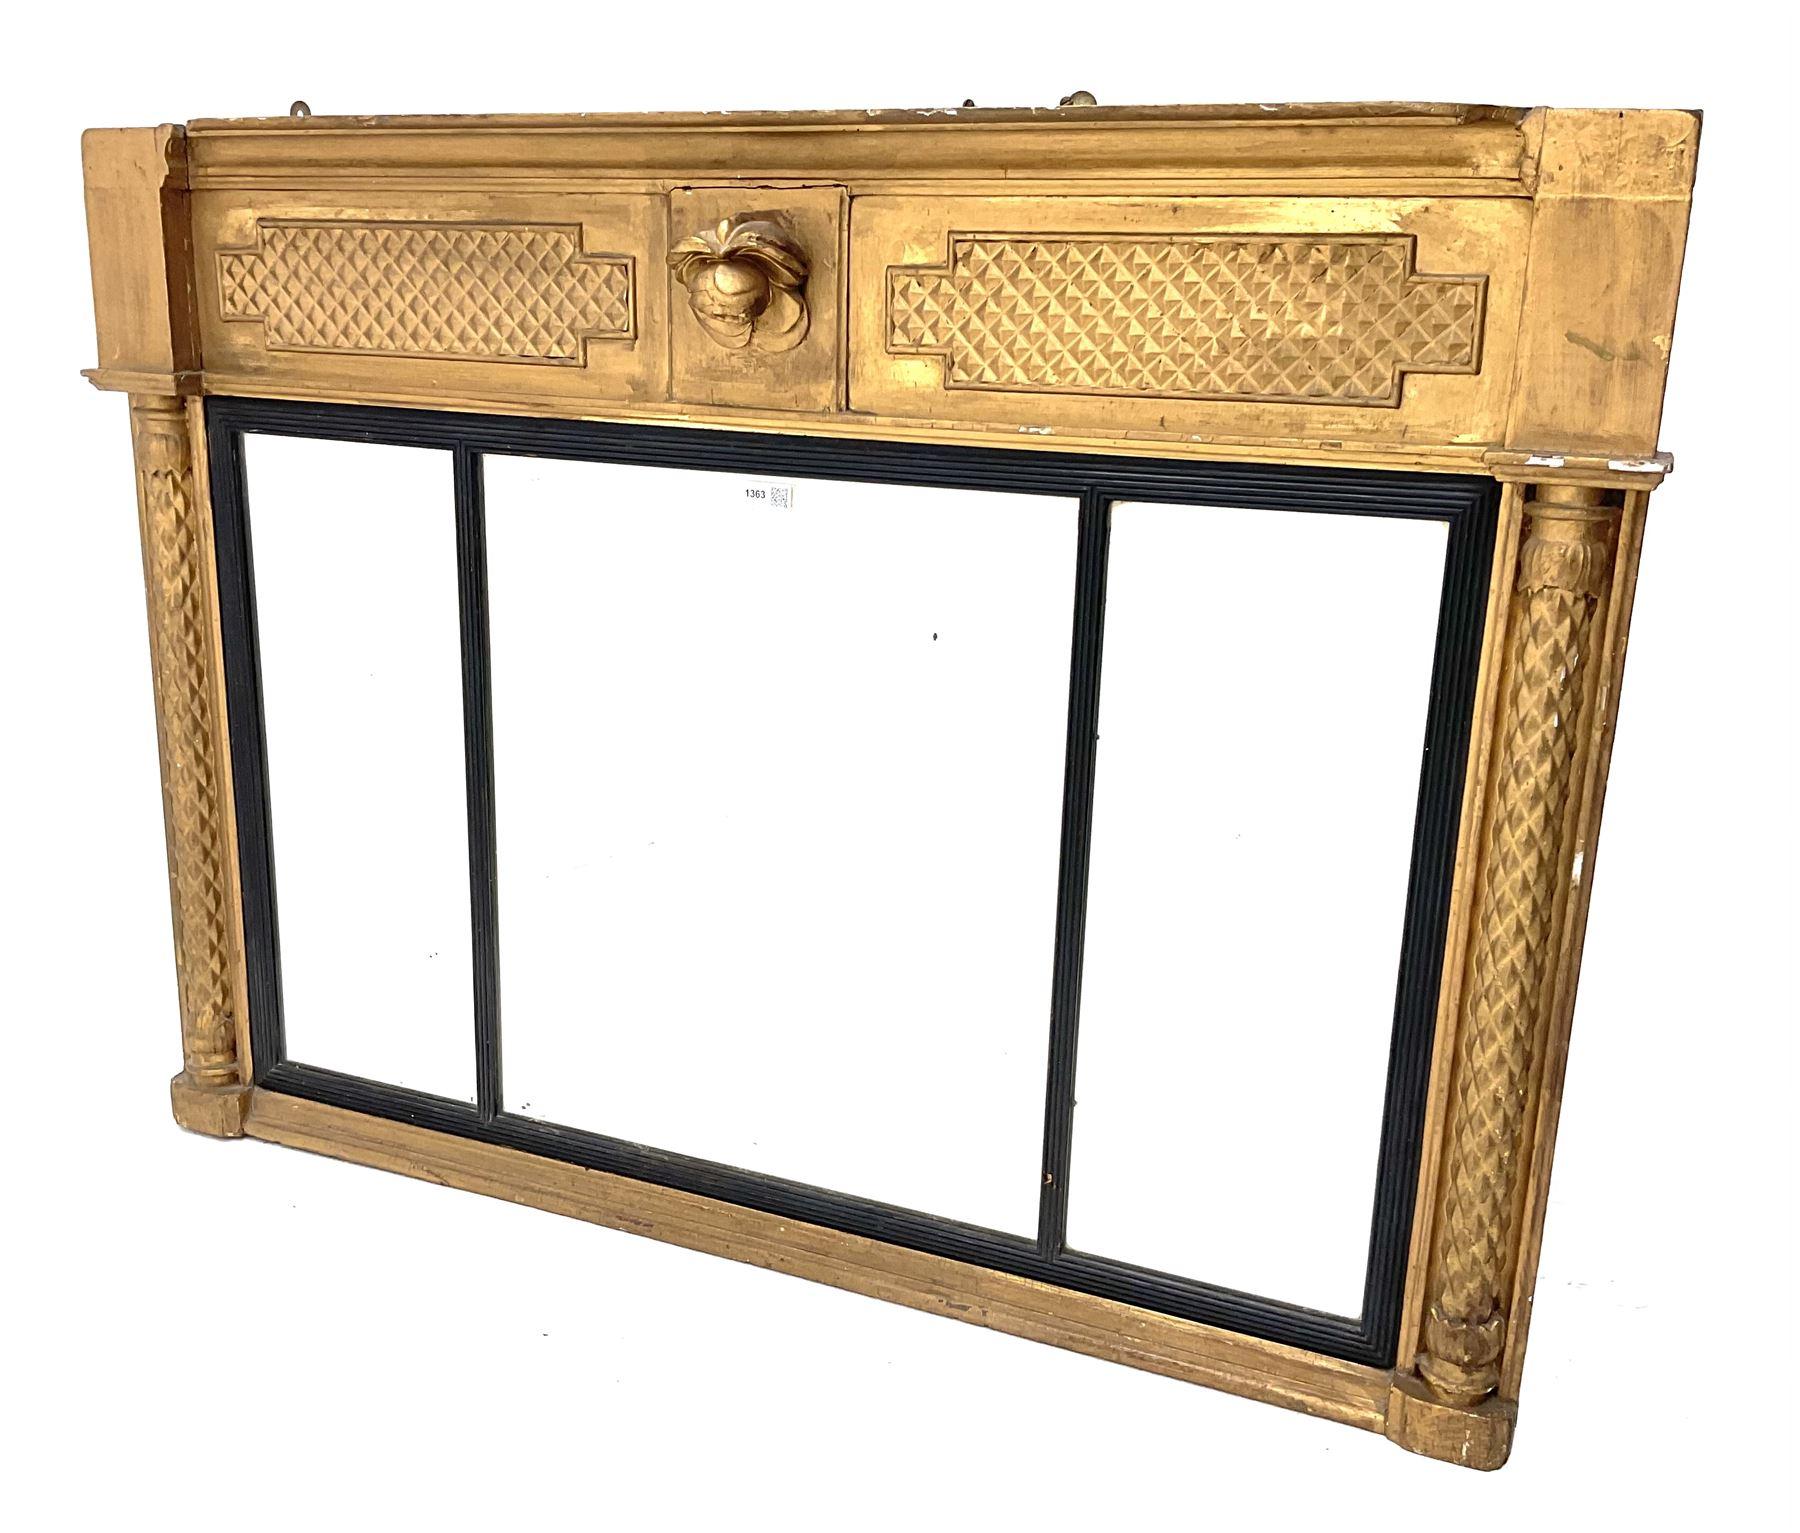 19th century gilt framed over mantle mirror